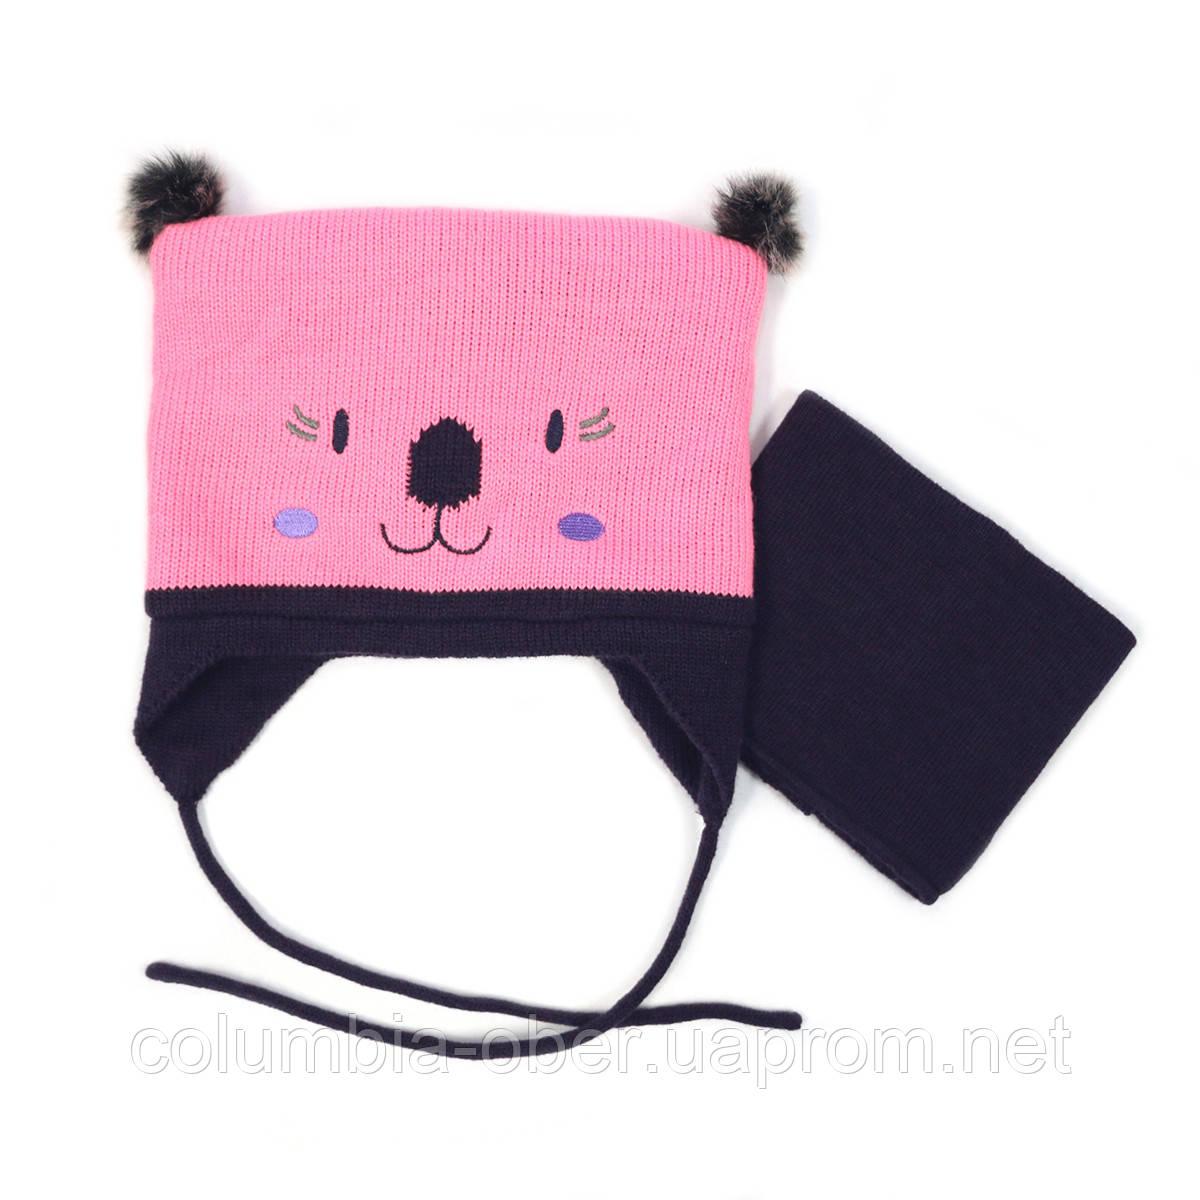 Зимняя шапка+манишка для девочки PELUCHE 40 BF ACC F16 Rose Gum. Размер 6/12м, 12/24м и 2/3.